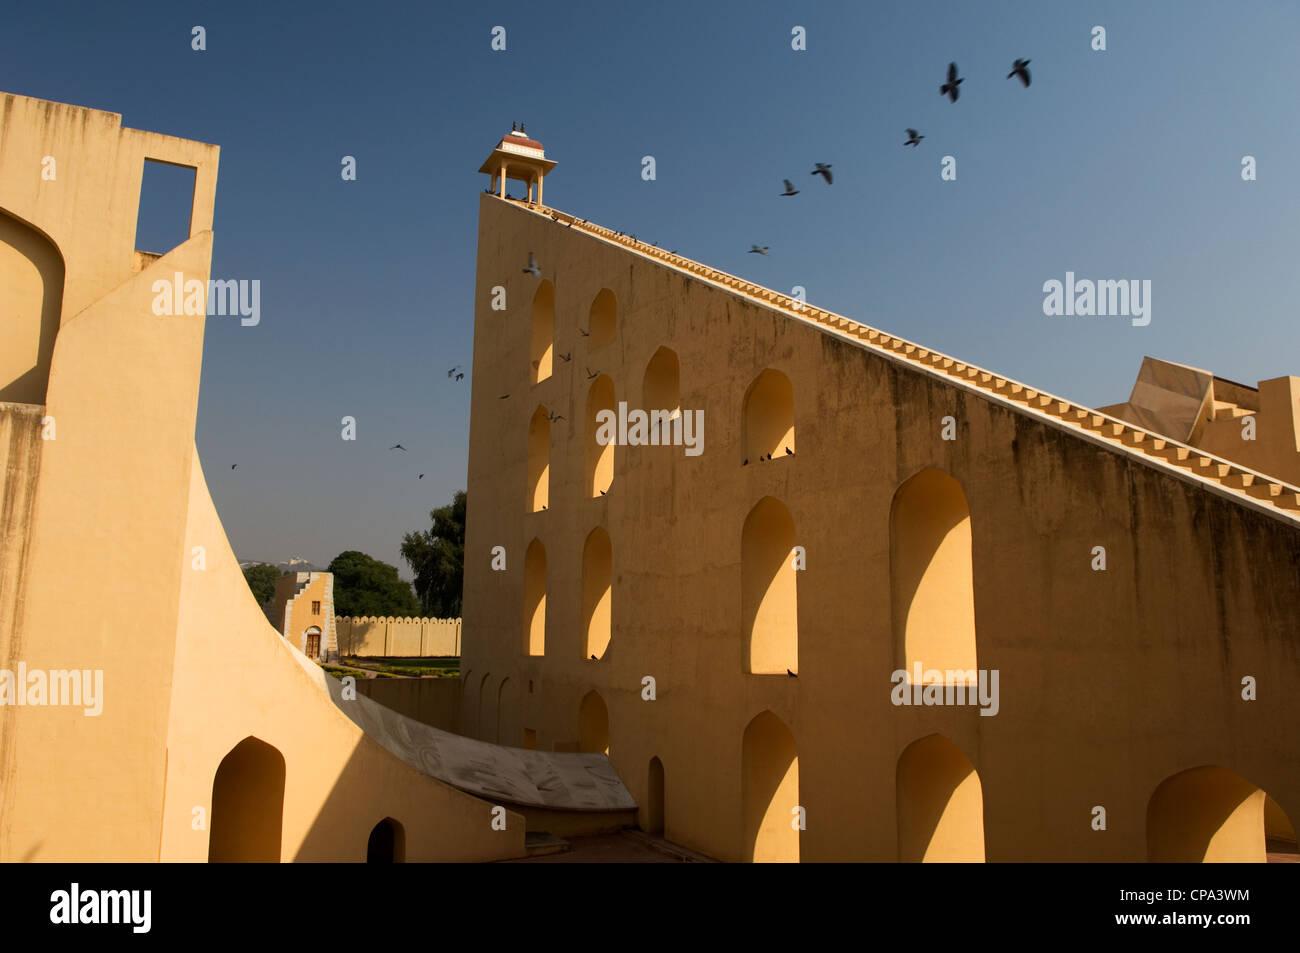 Jantar Mantar, the old (17th century) observatory of Jai Singh, Jaipur, Rajasthan, India - Stock Image